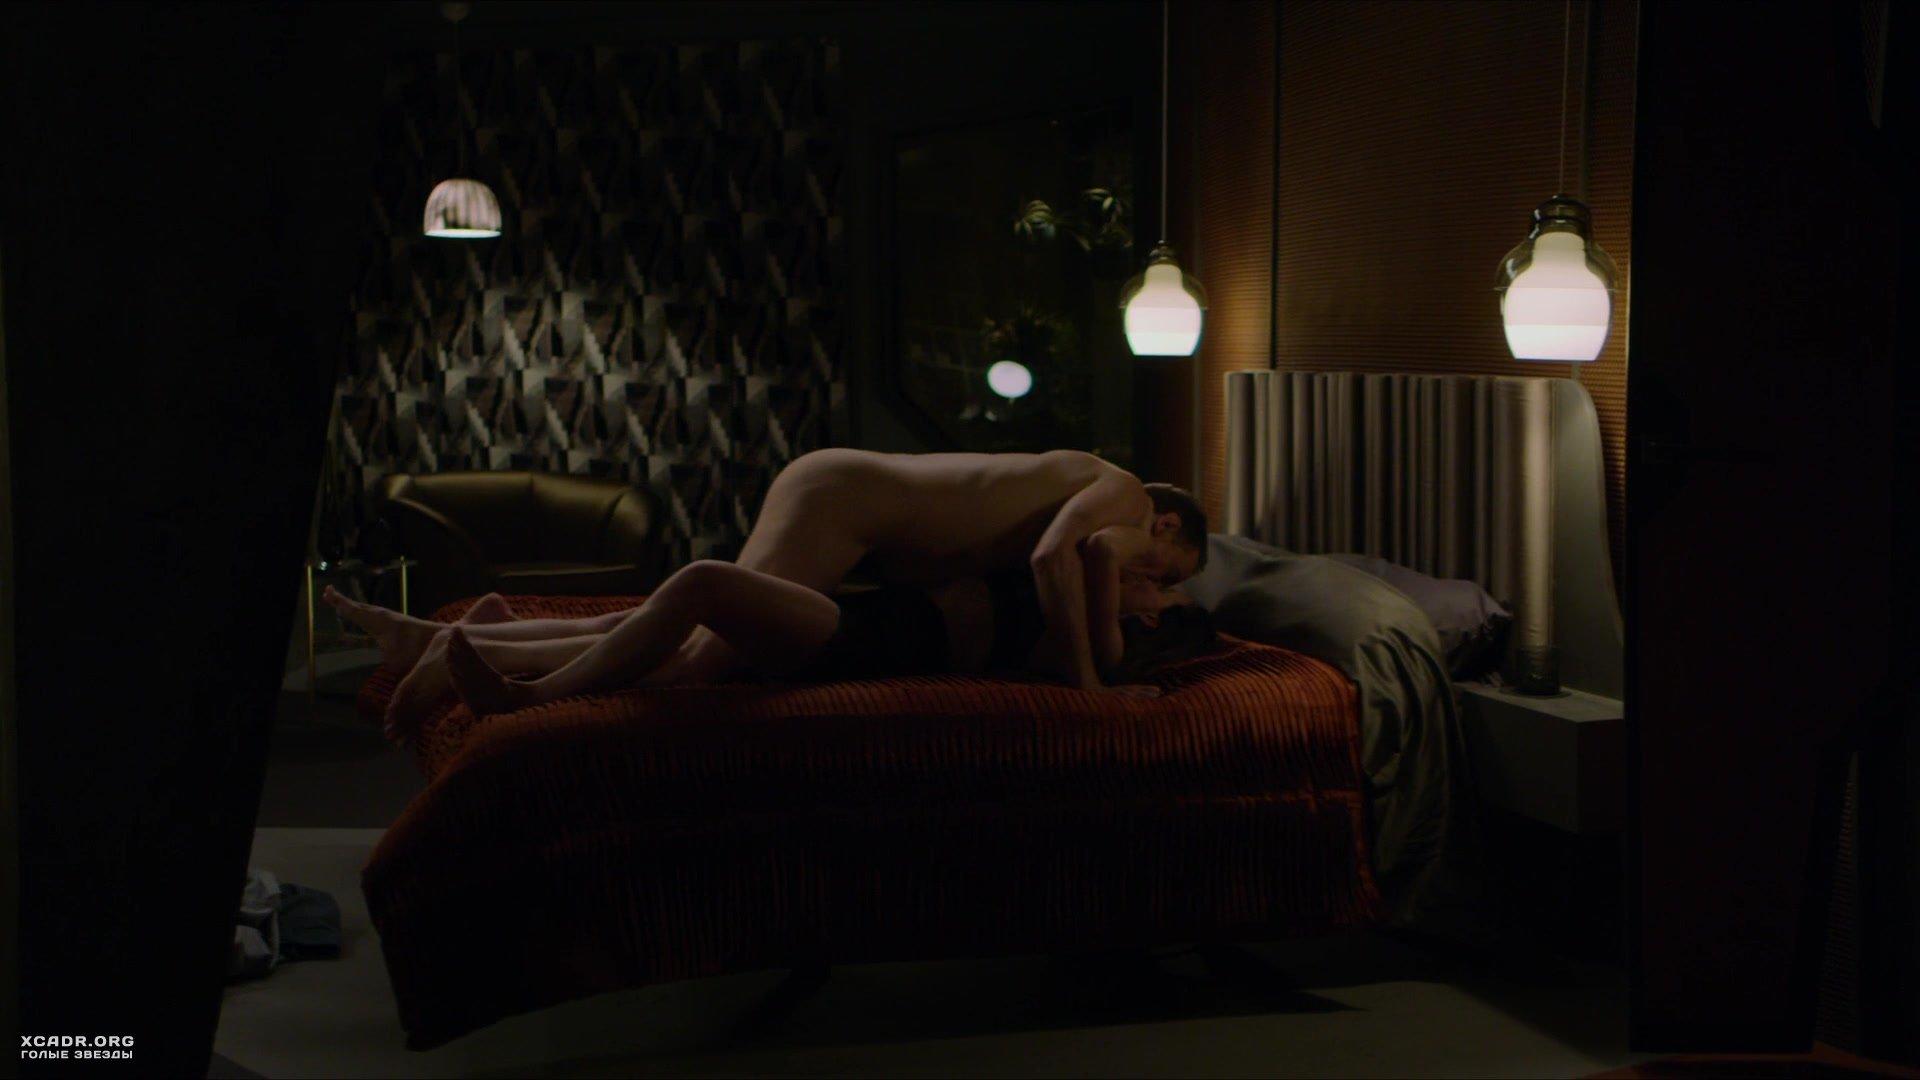 Bryan cranston's awkward naked scene